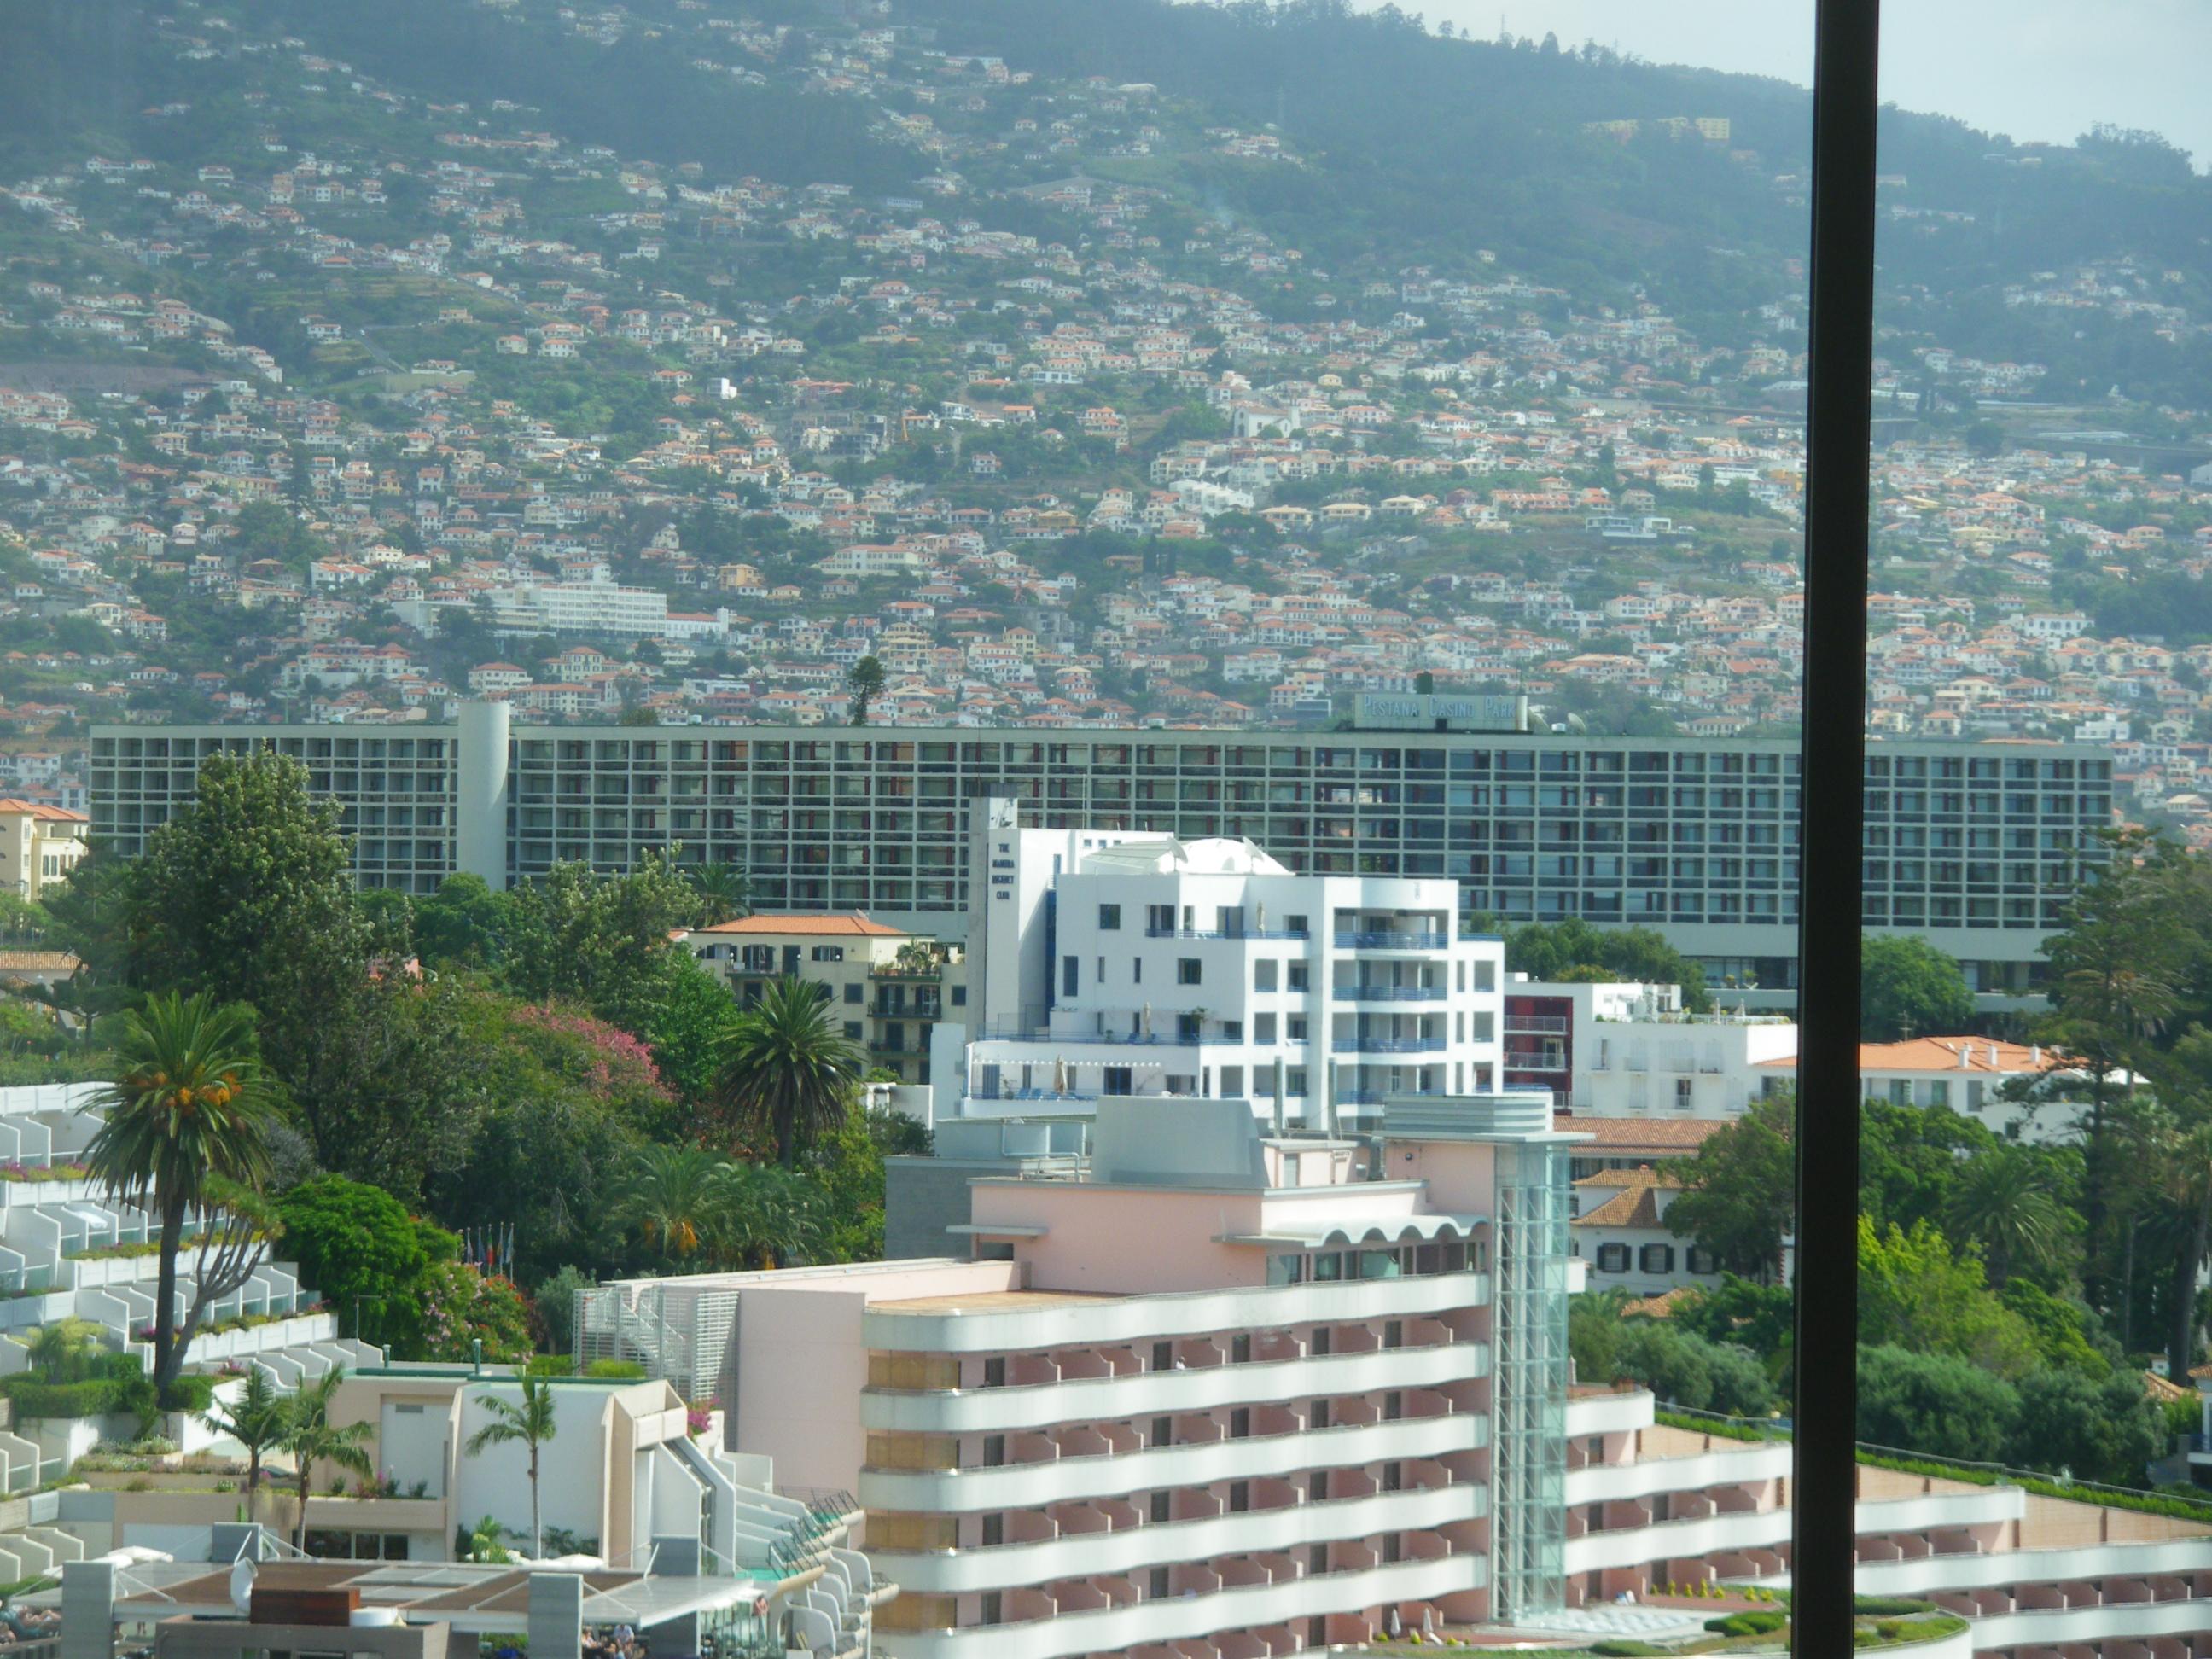 pestana casino park hotel funchal portugal